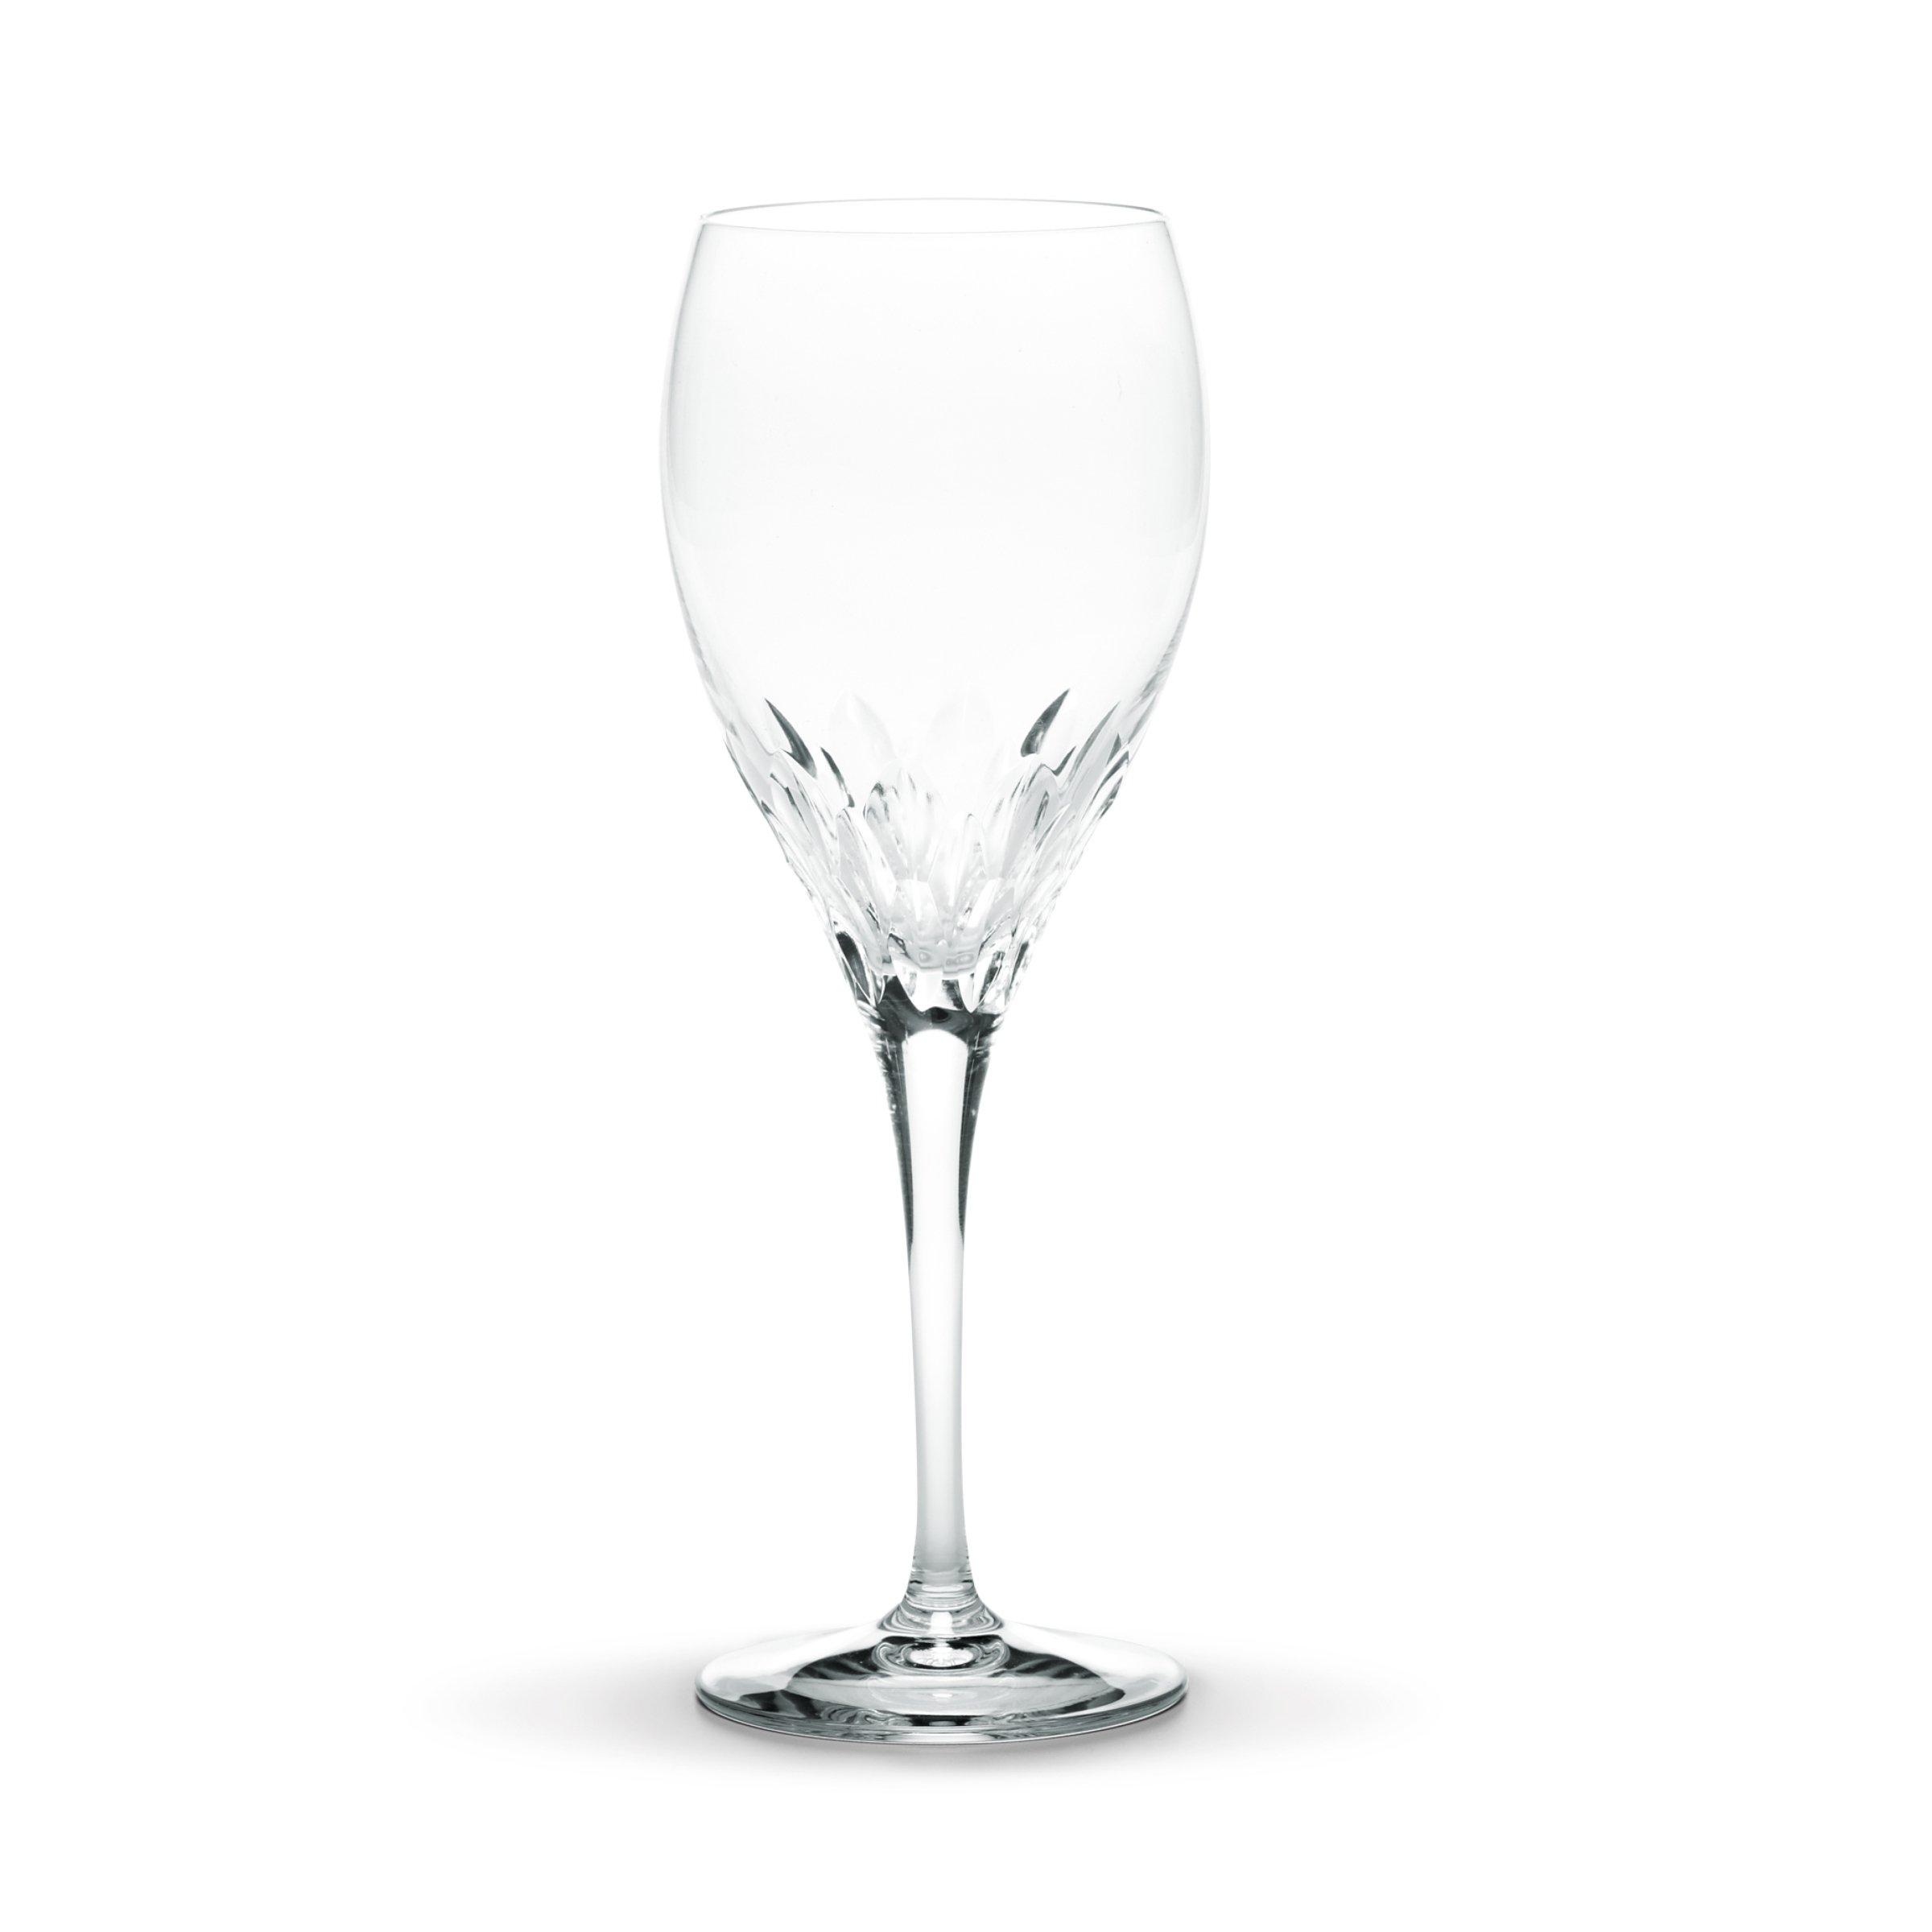 Mikasa Capella Crystal Goblet Wine Glass, 10.25-Ounce